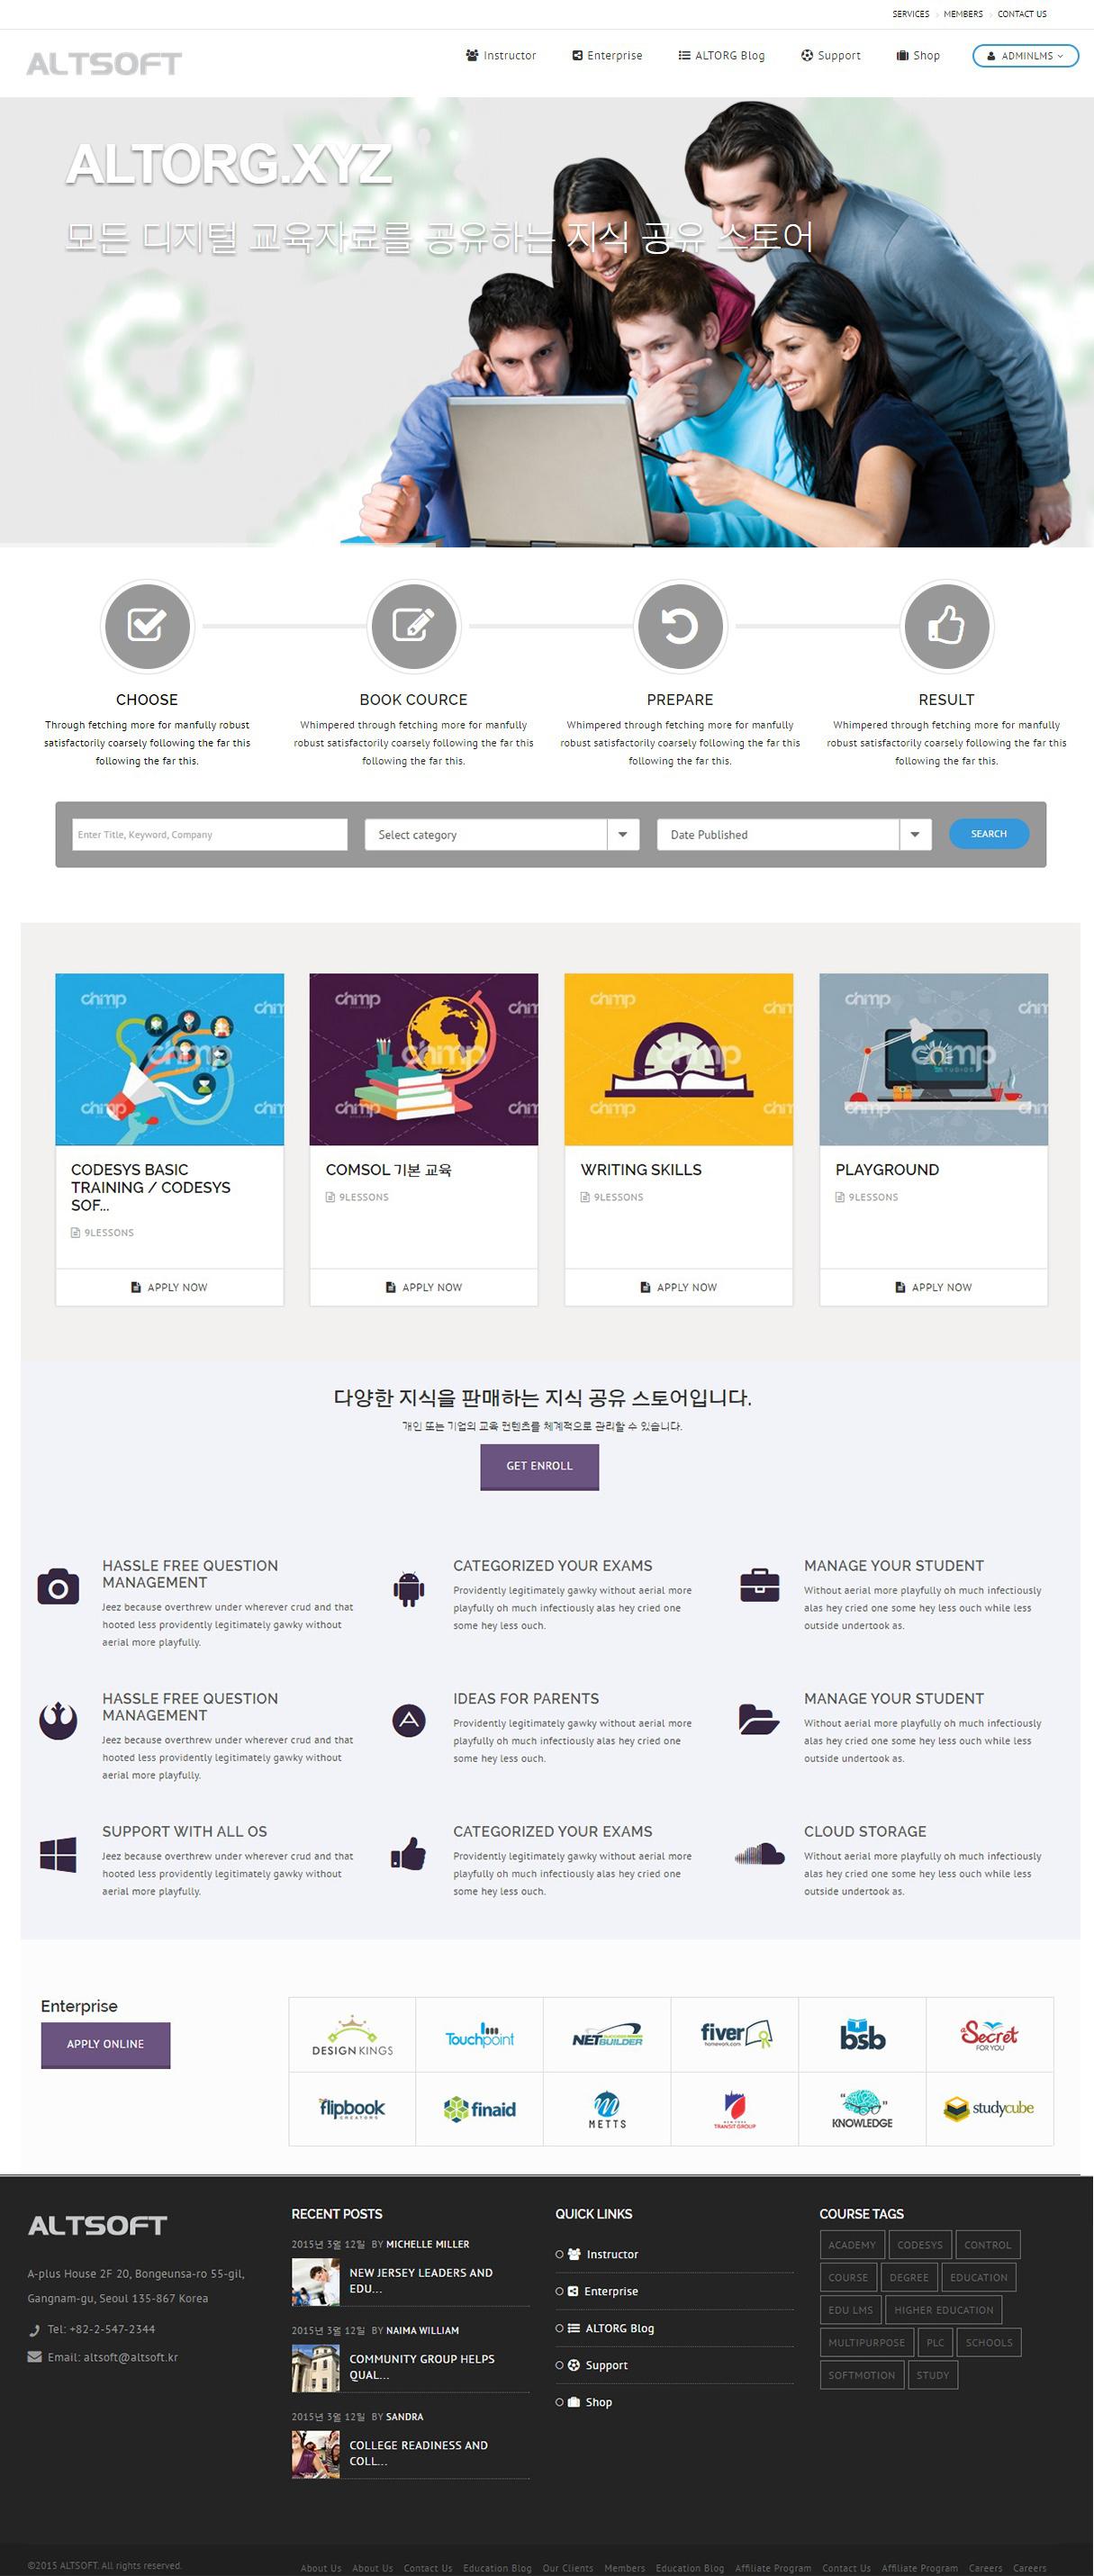 Altsoft-LMS---다른-워드프레스-사이트